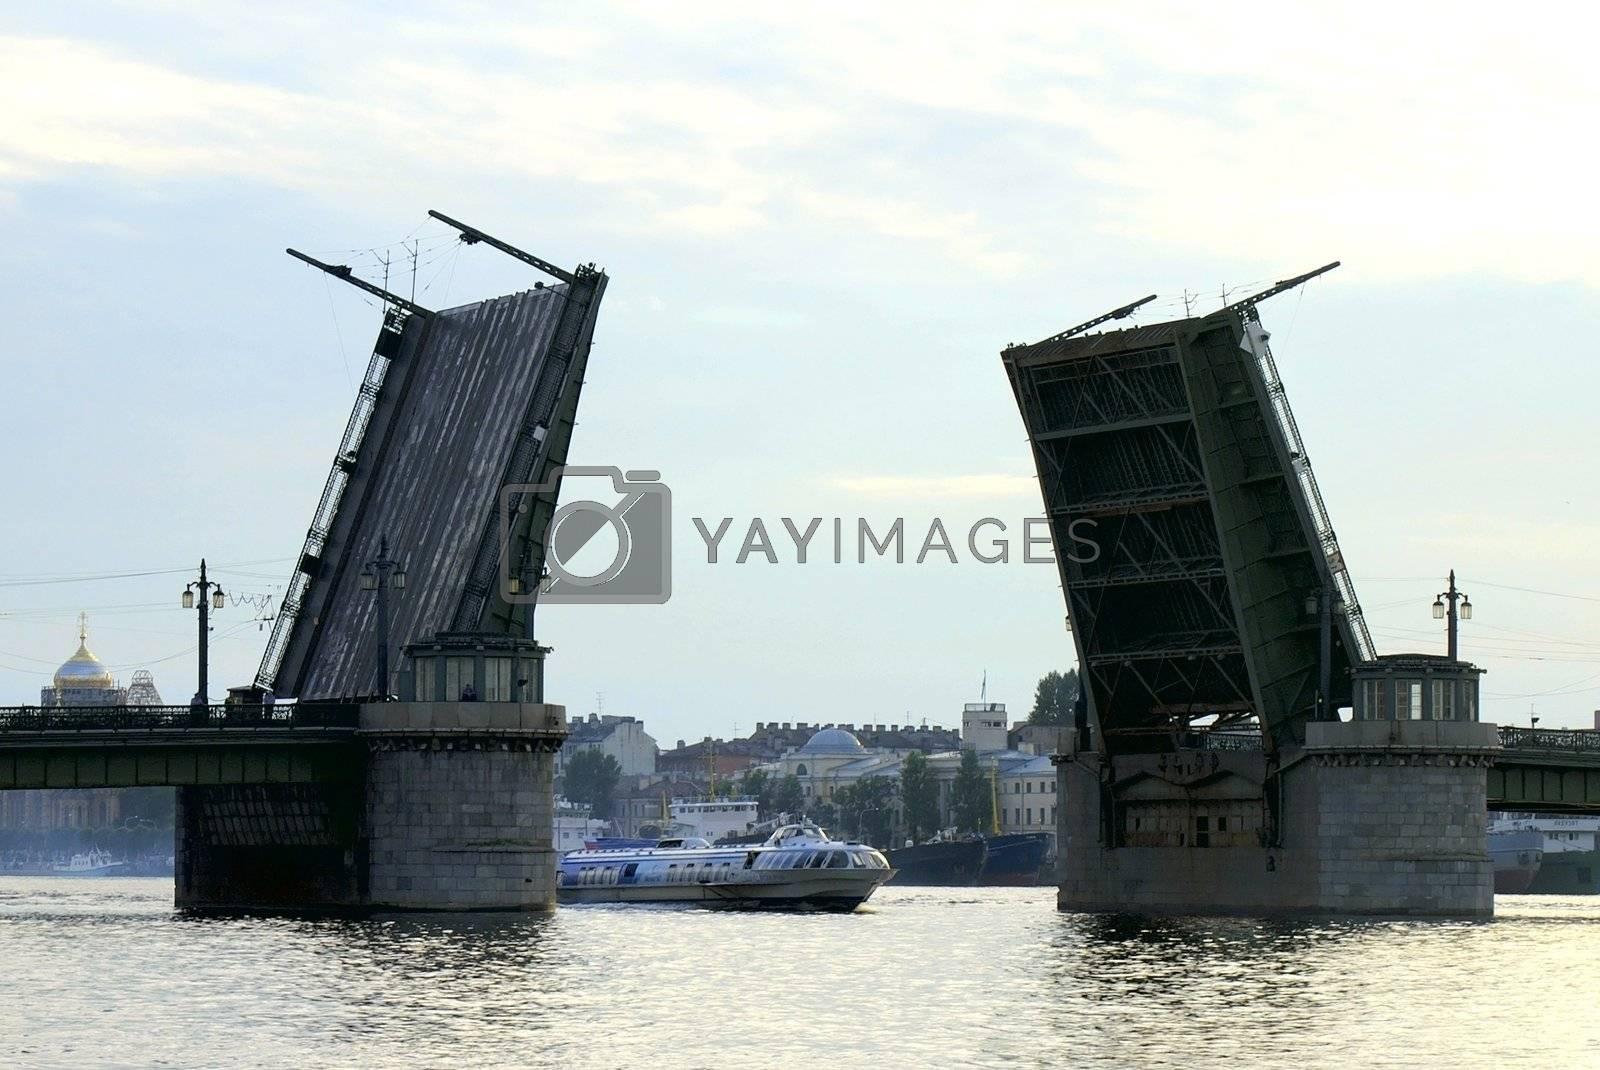 Raised Schmidt's Drawbridge over Neva river at Dusk in Saint Petersburg, Russia